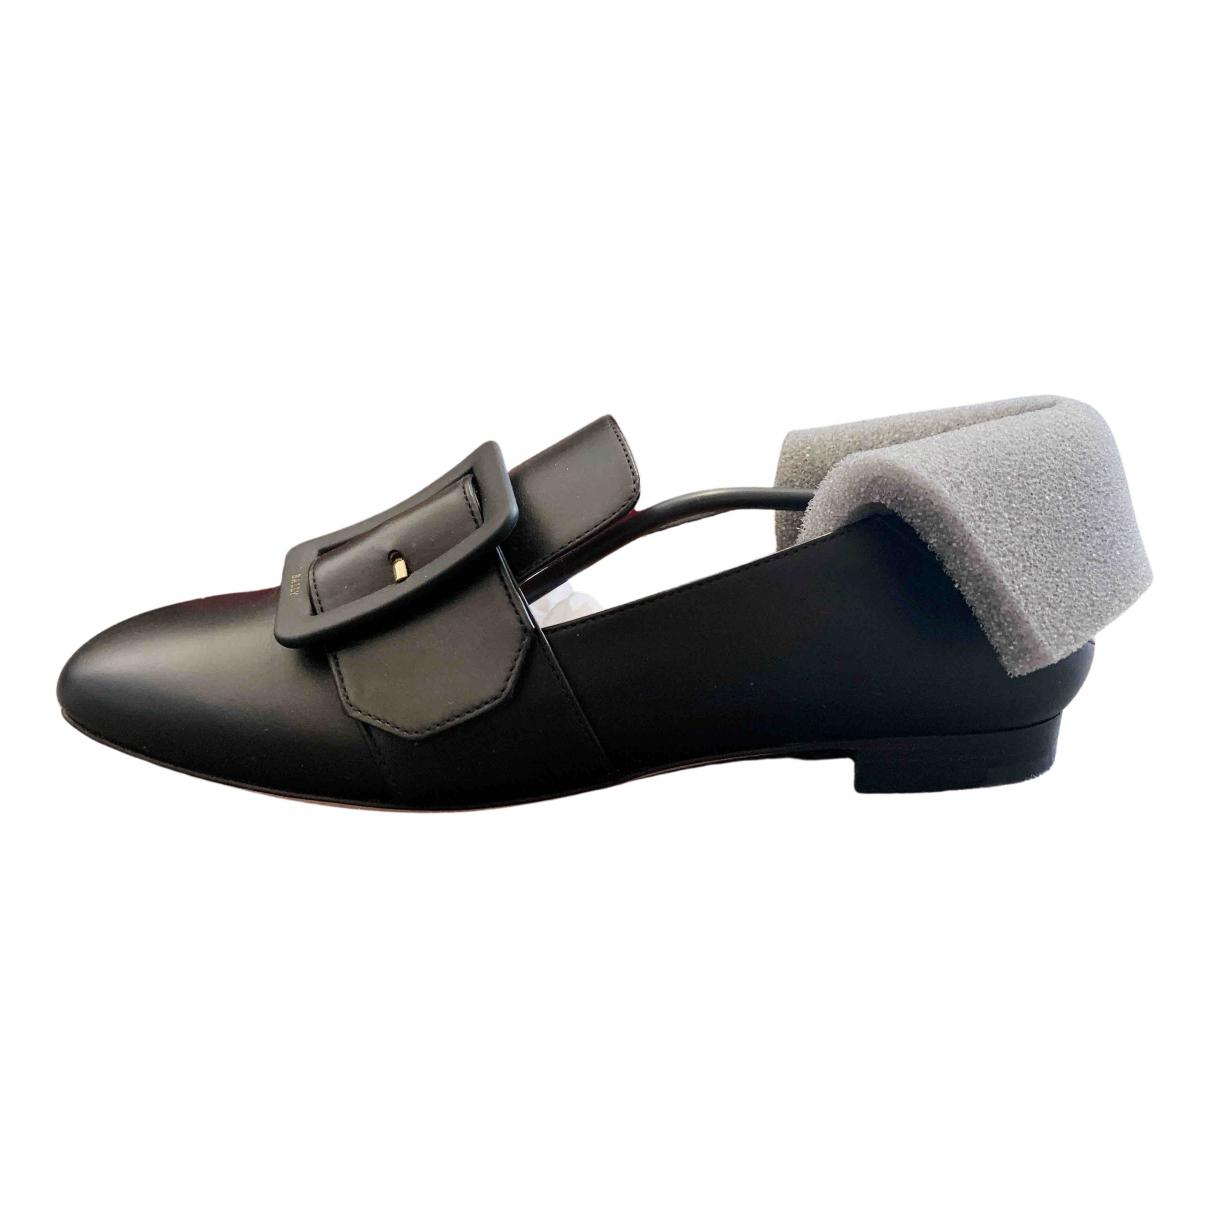 Bally \N Black Leather Flats for Women 35 EU